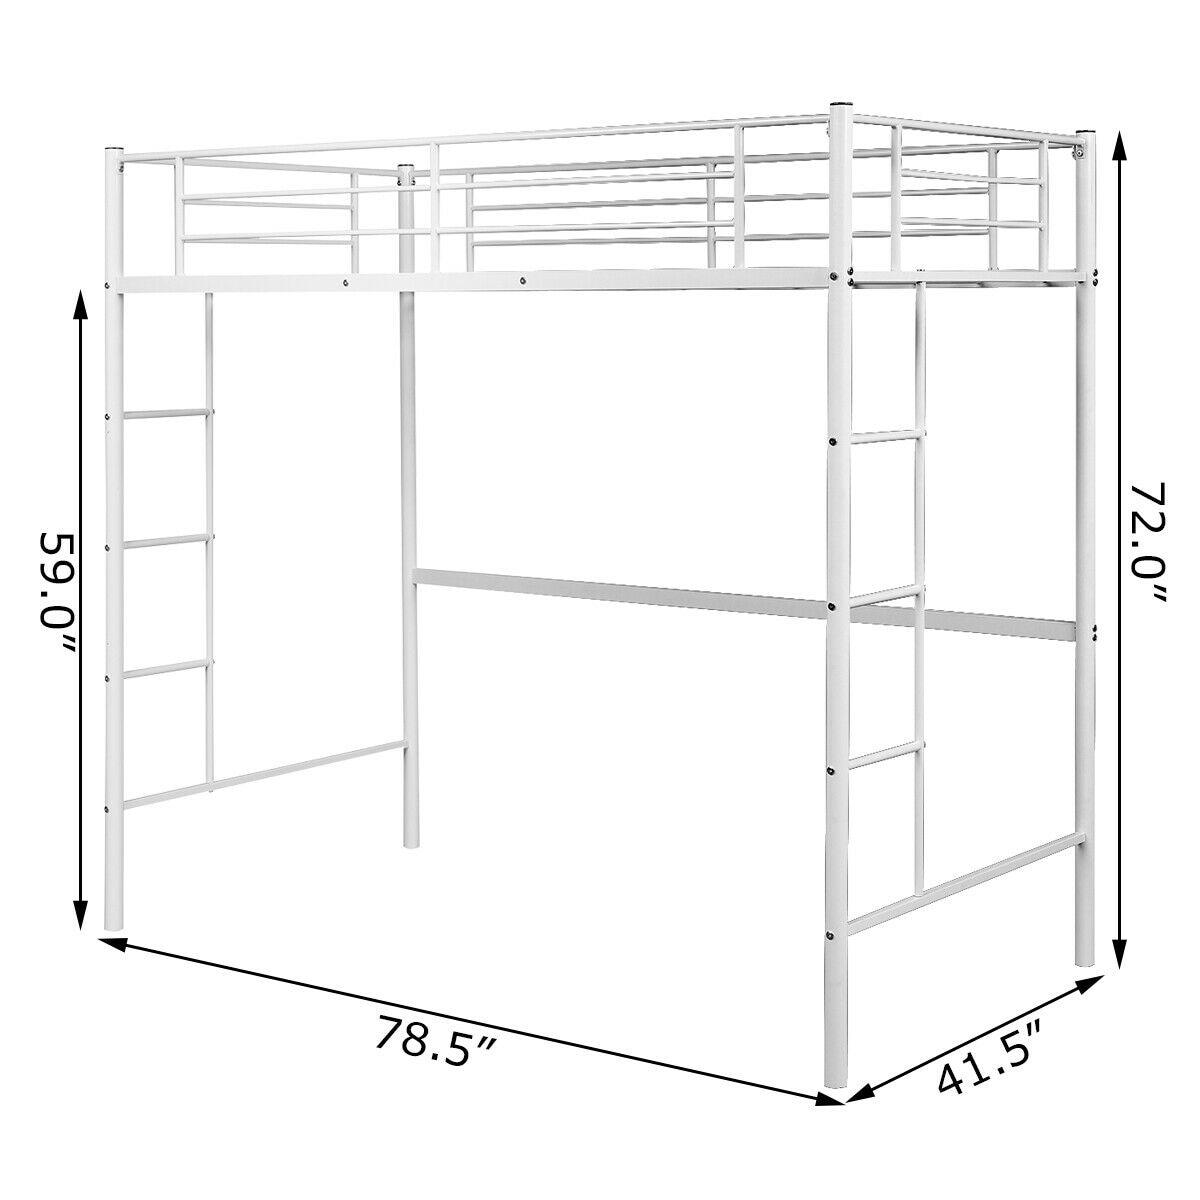 Gymax Twin Loft Bed Metal Bunk Ladder Beds Boys Girls Teens Kids On Sale Overstock 22833861